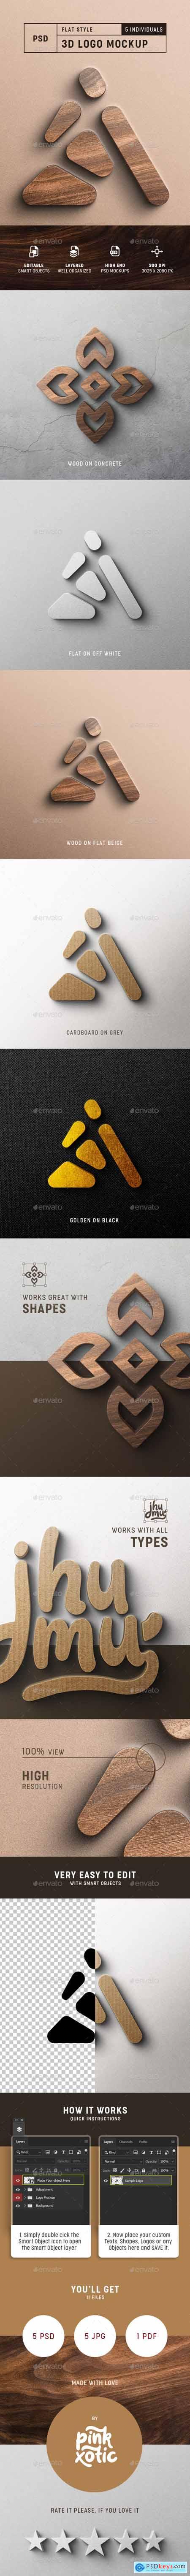 3D Logo Mockup Realistic & Pro Quality - Set of Five 26510224